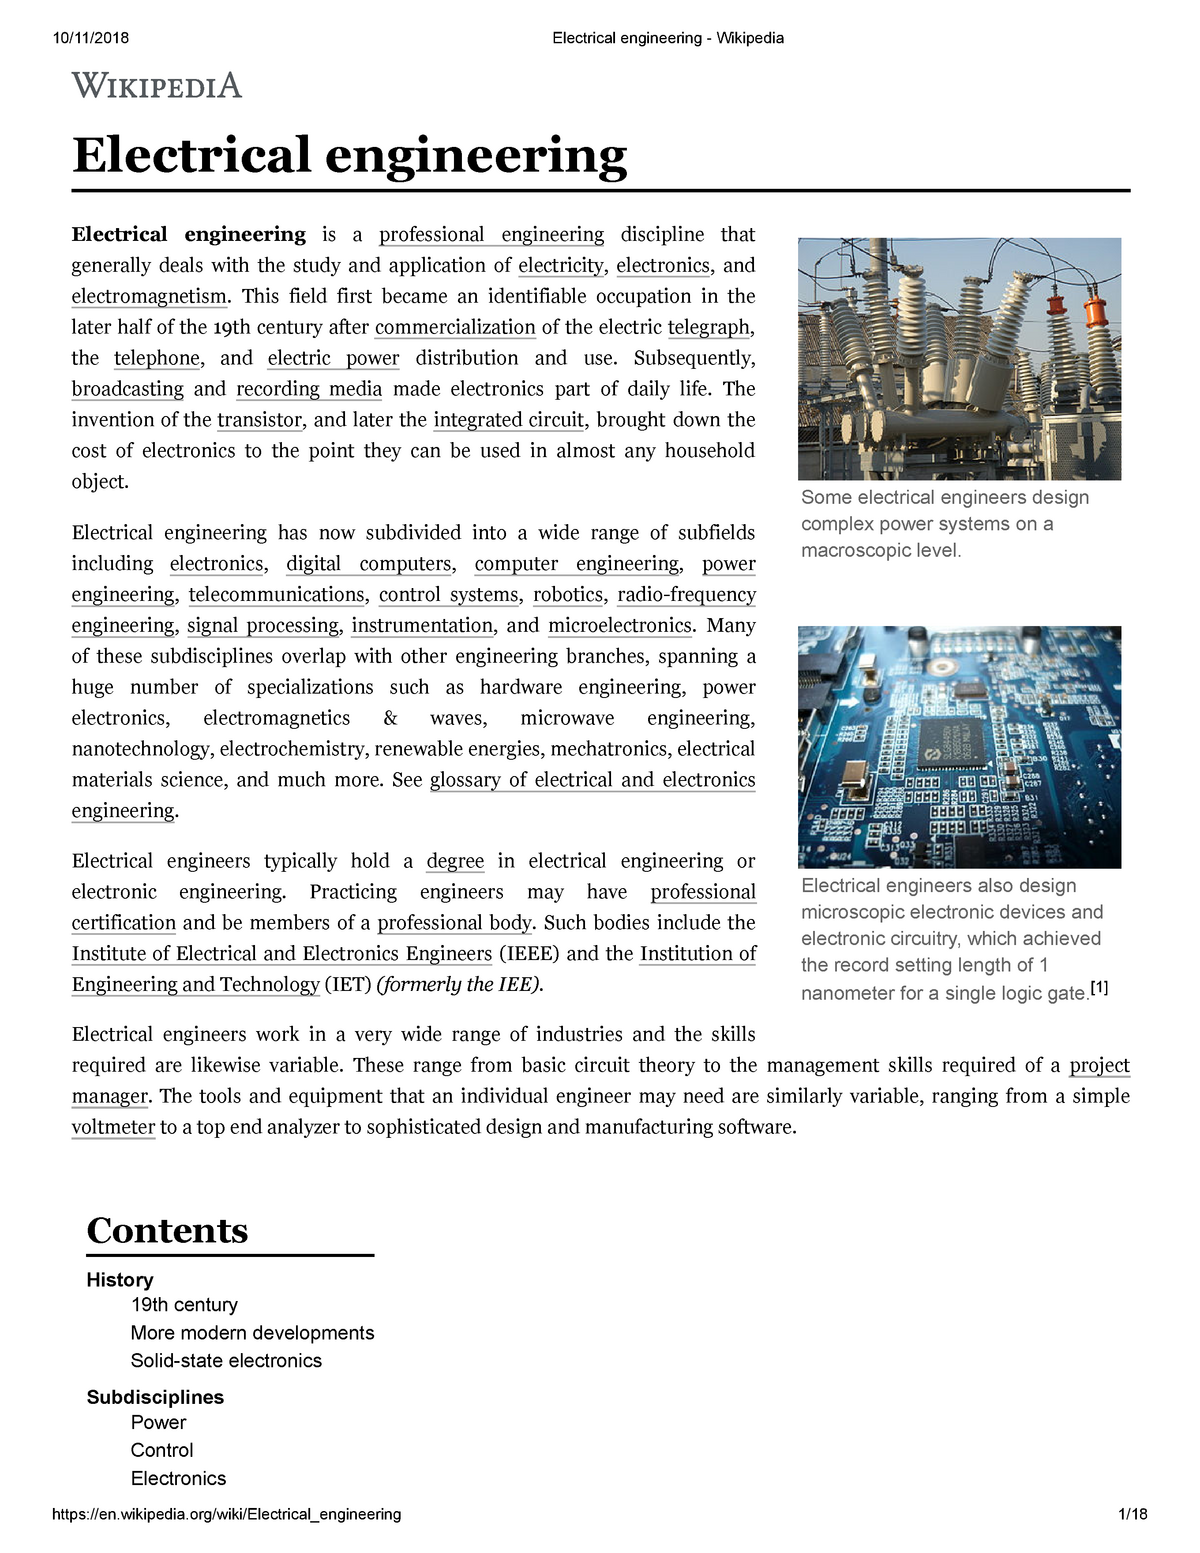 Electrical engineering - Wikipedia - ECE - StuDocu